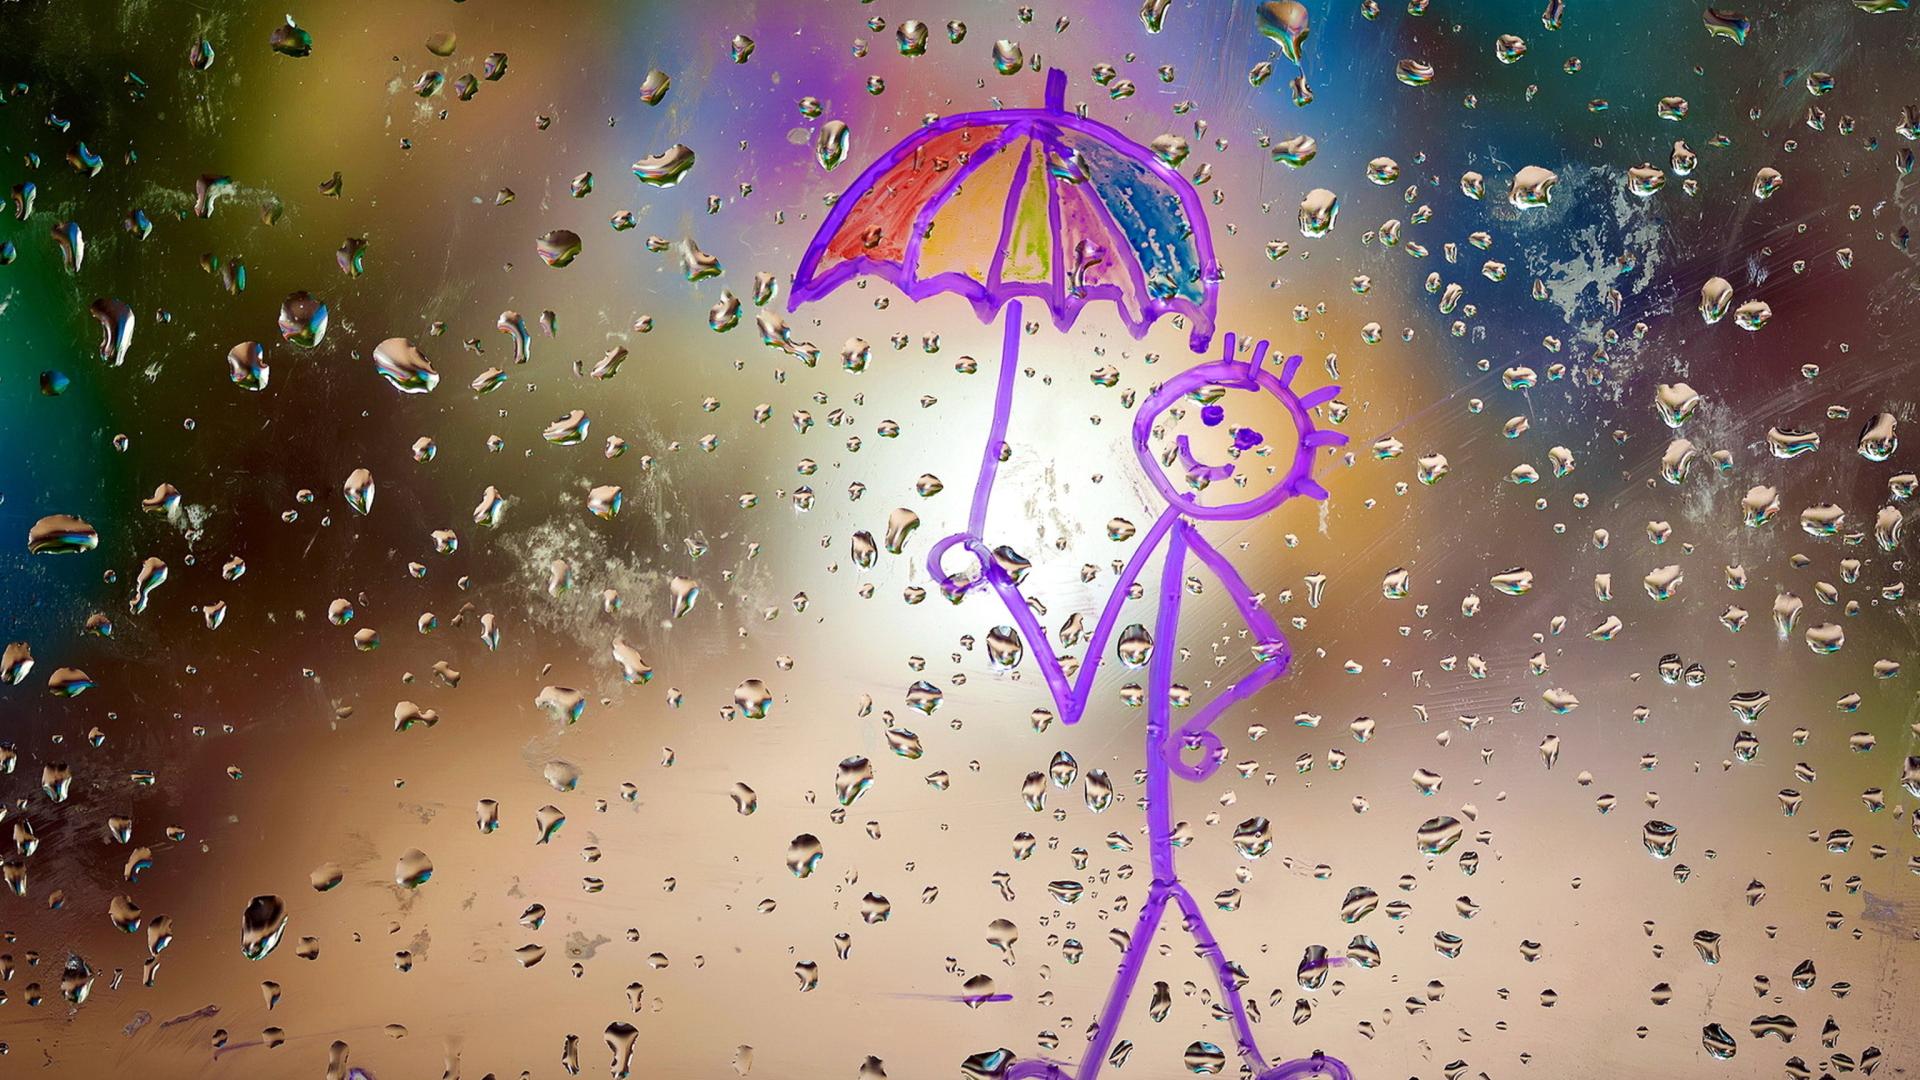 happy rain wallpaper for 1920x1080